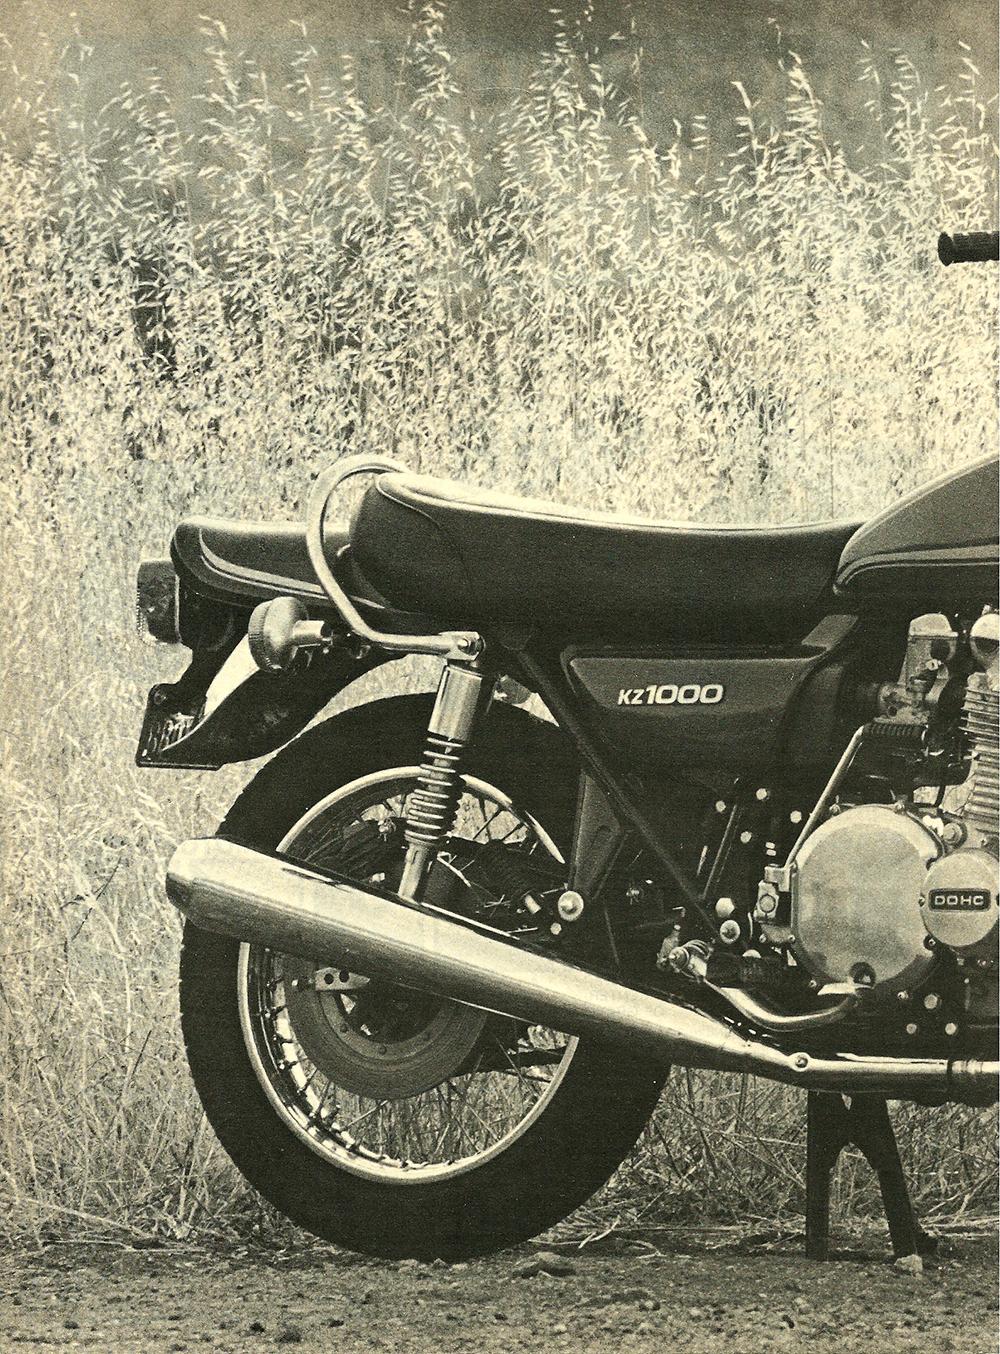 1978 Kawasaki KZ1000 road test 01.jpg